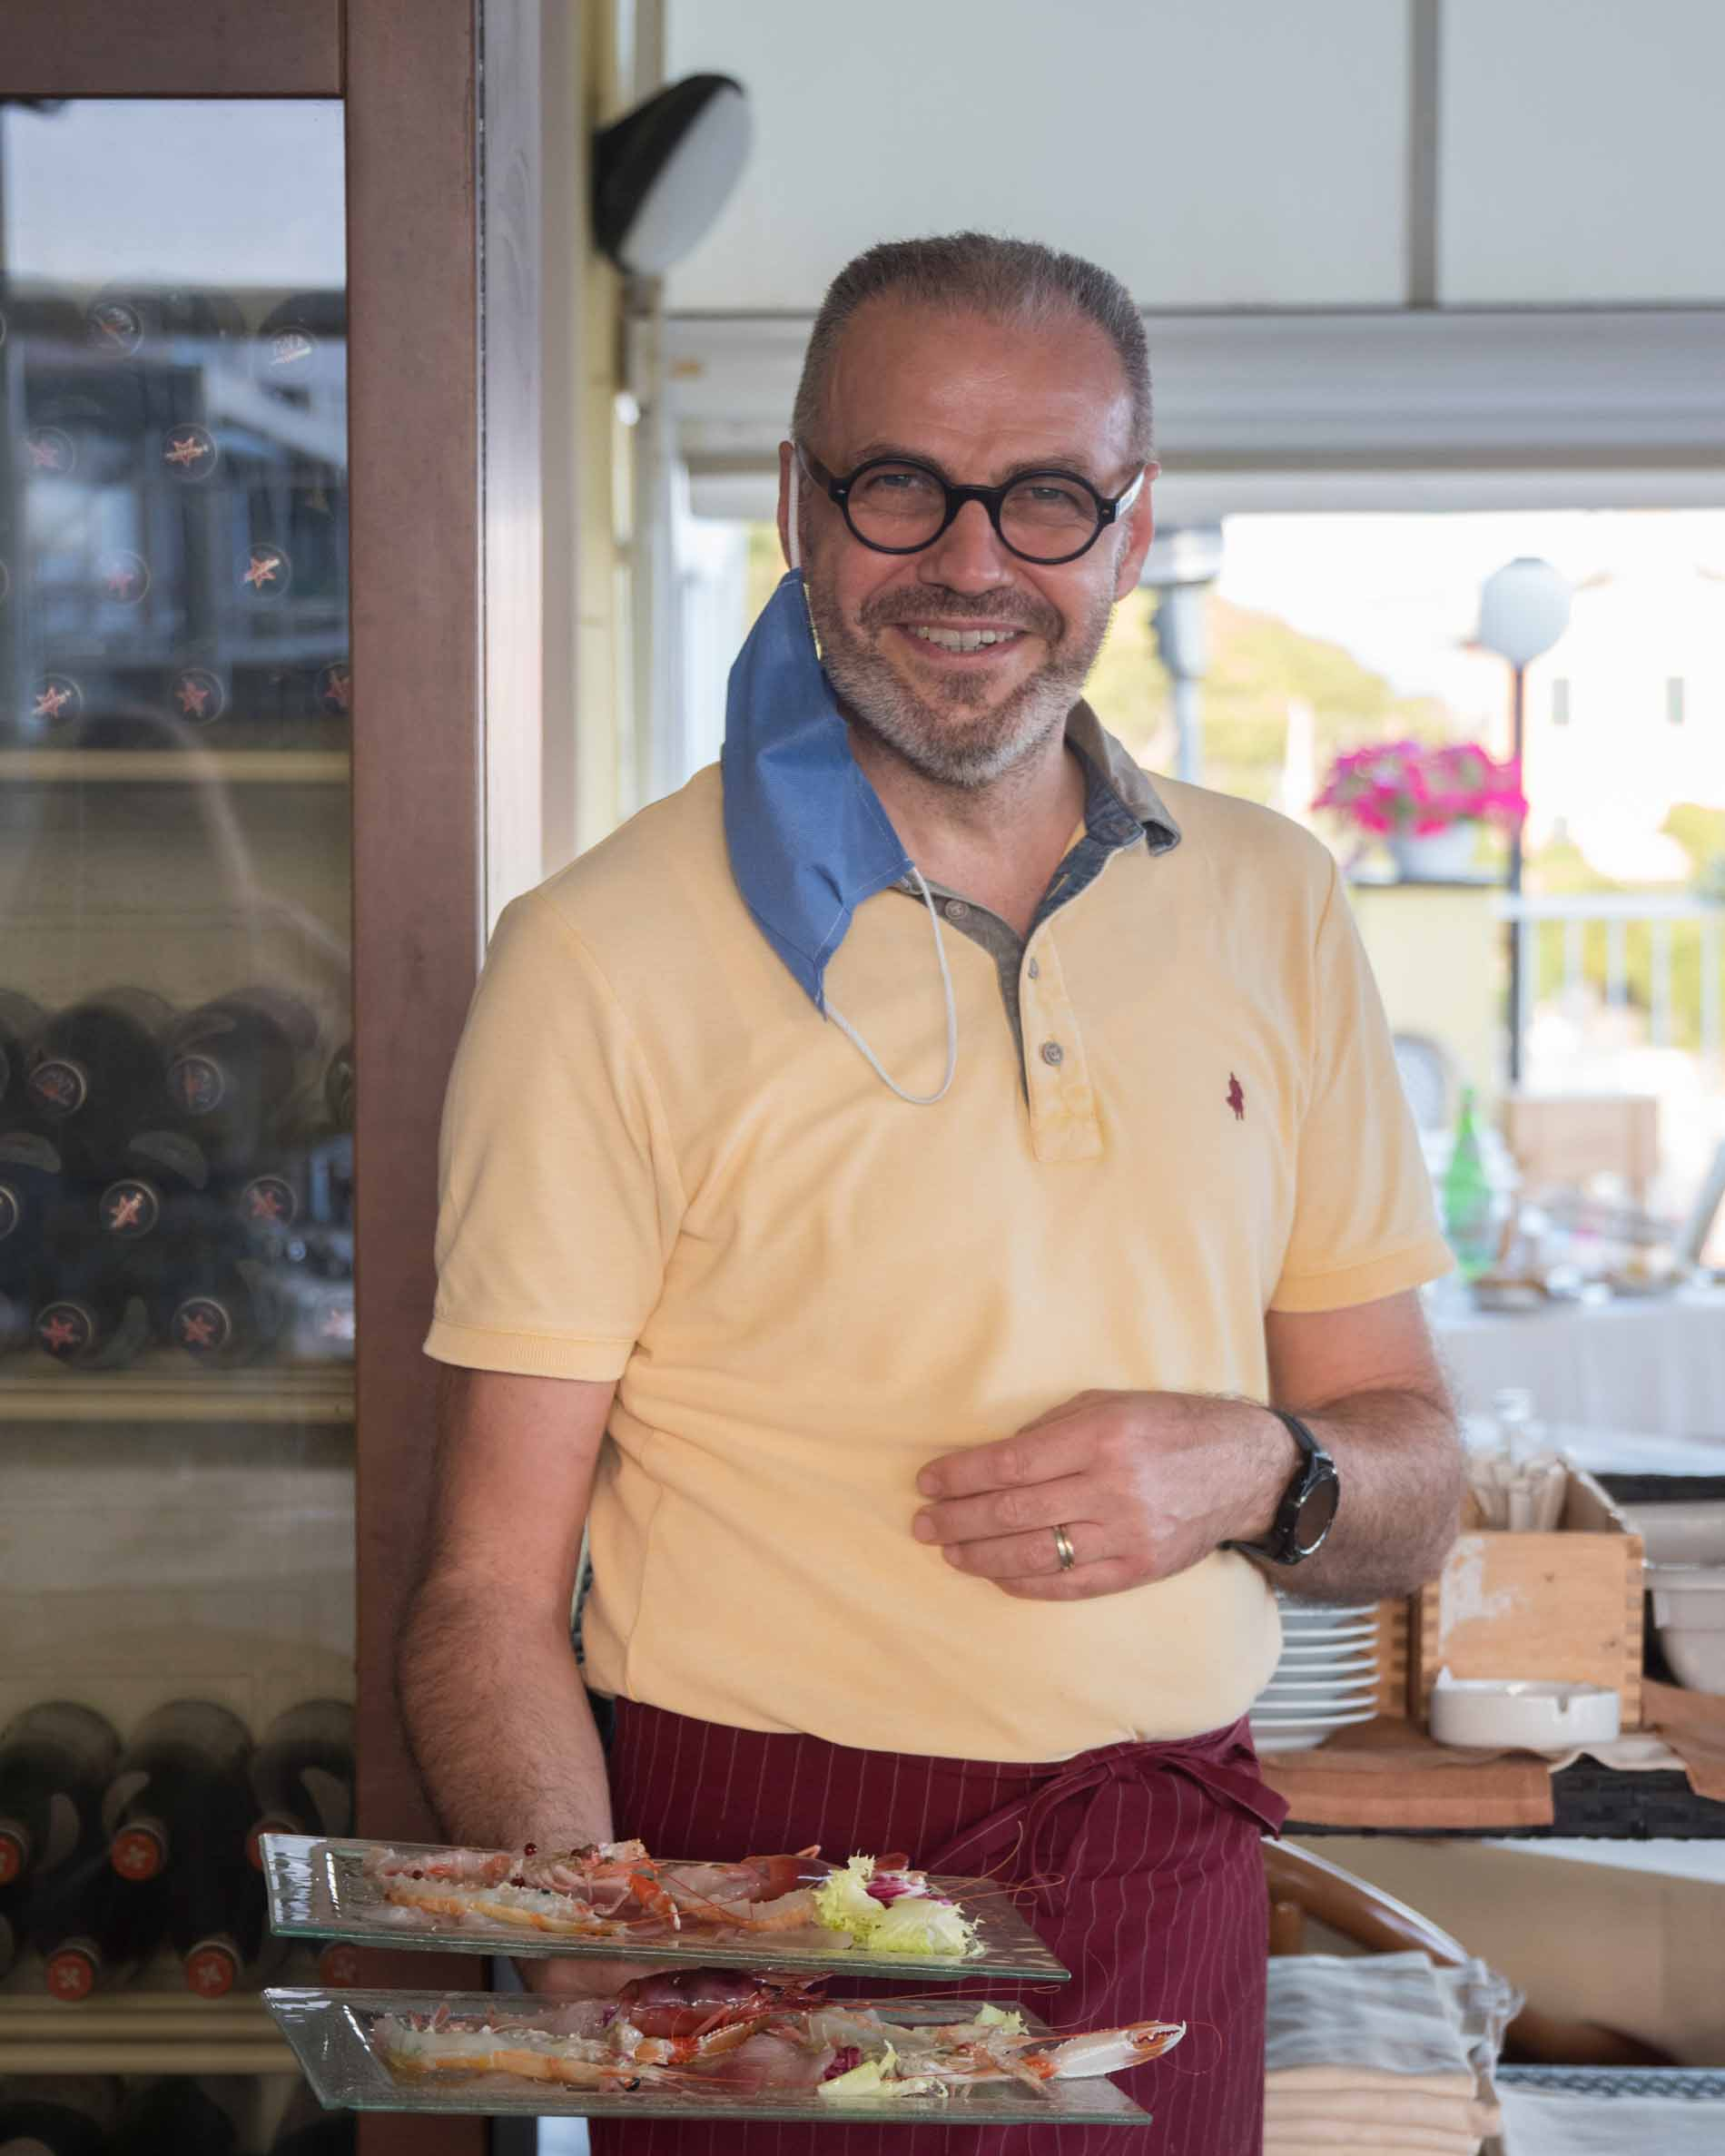 la-piedigrotta-ristorante-da-carmine-e-antonio-159